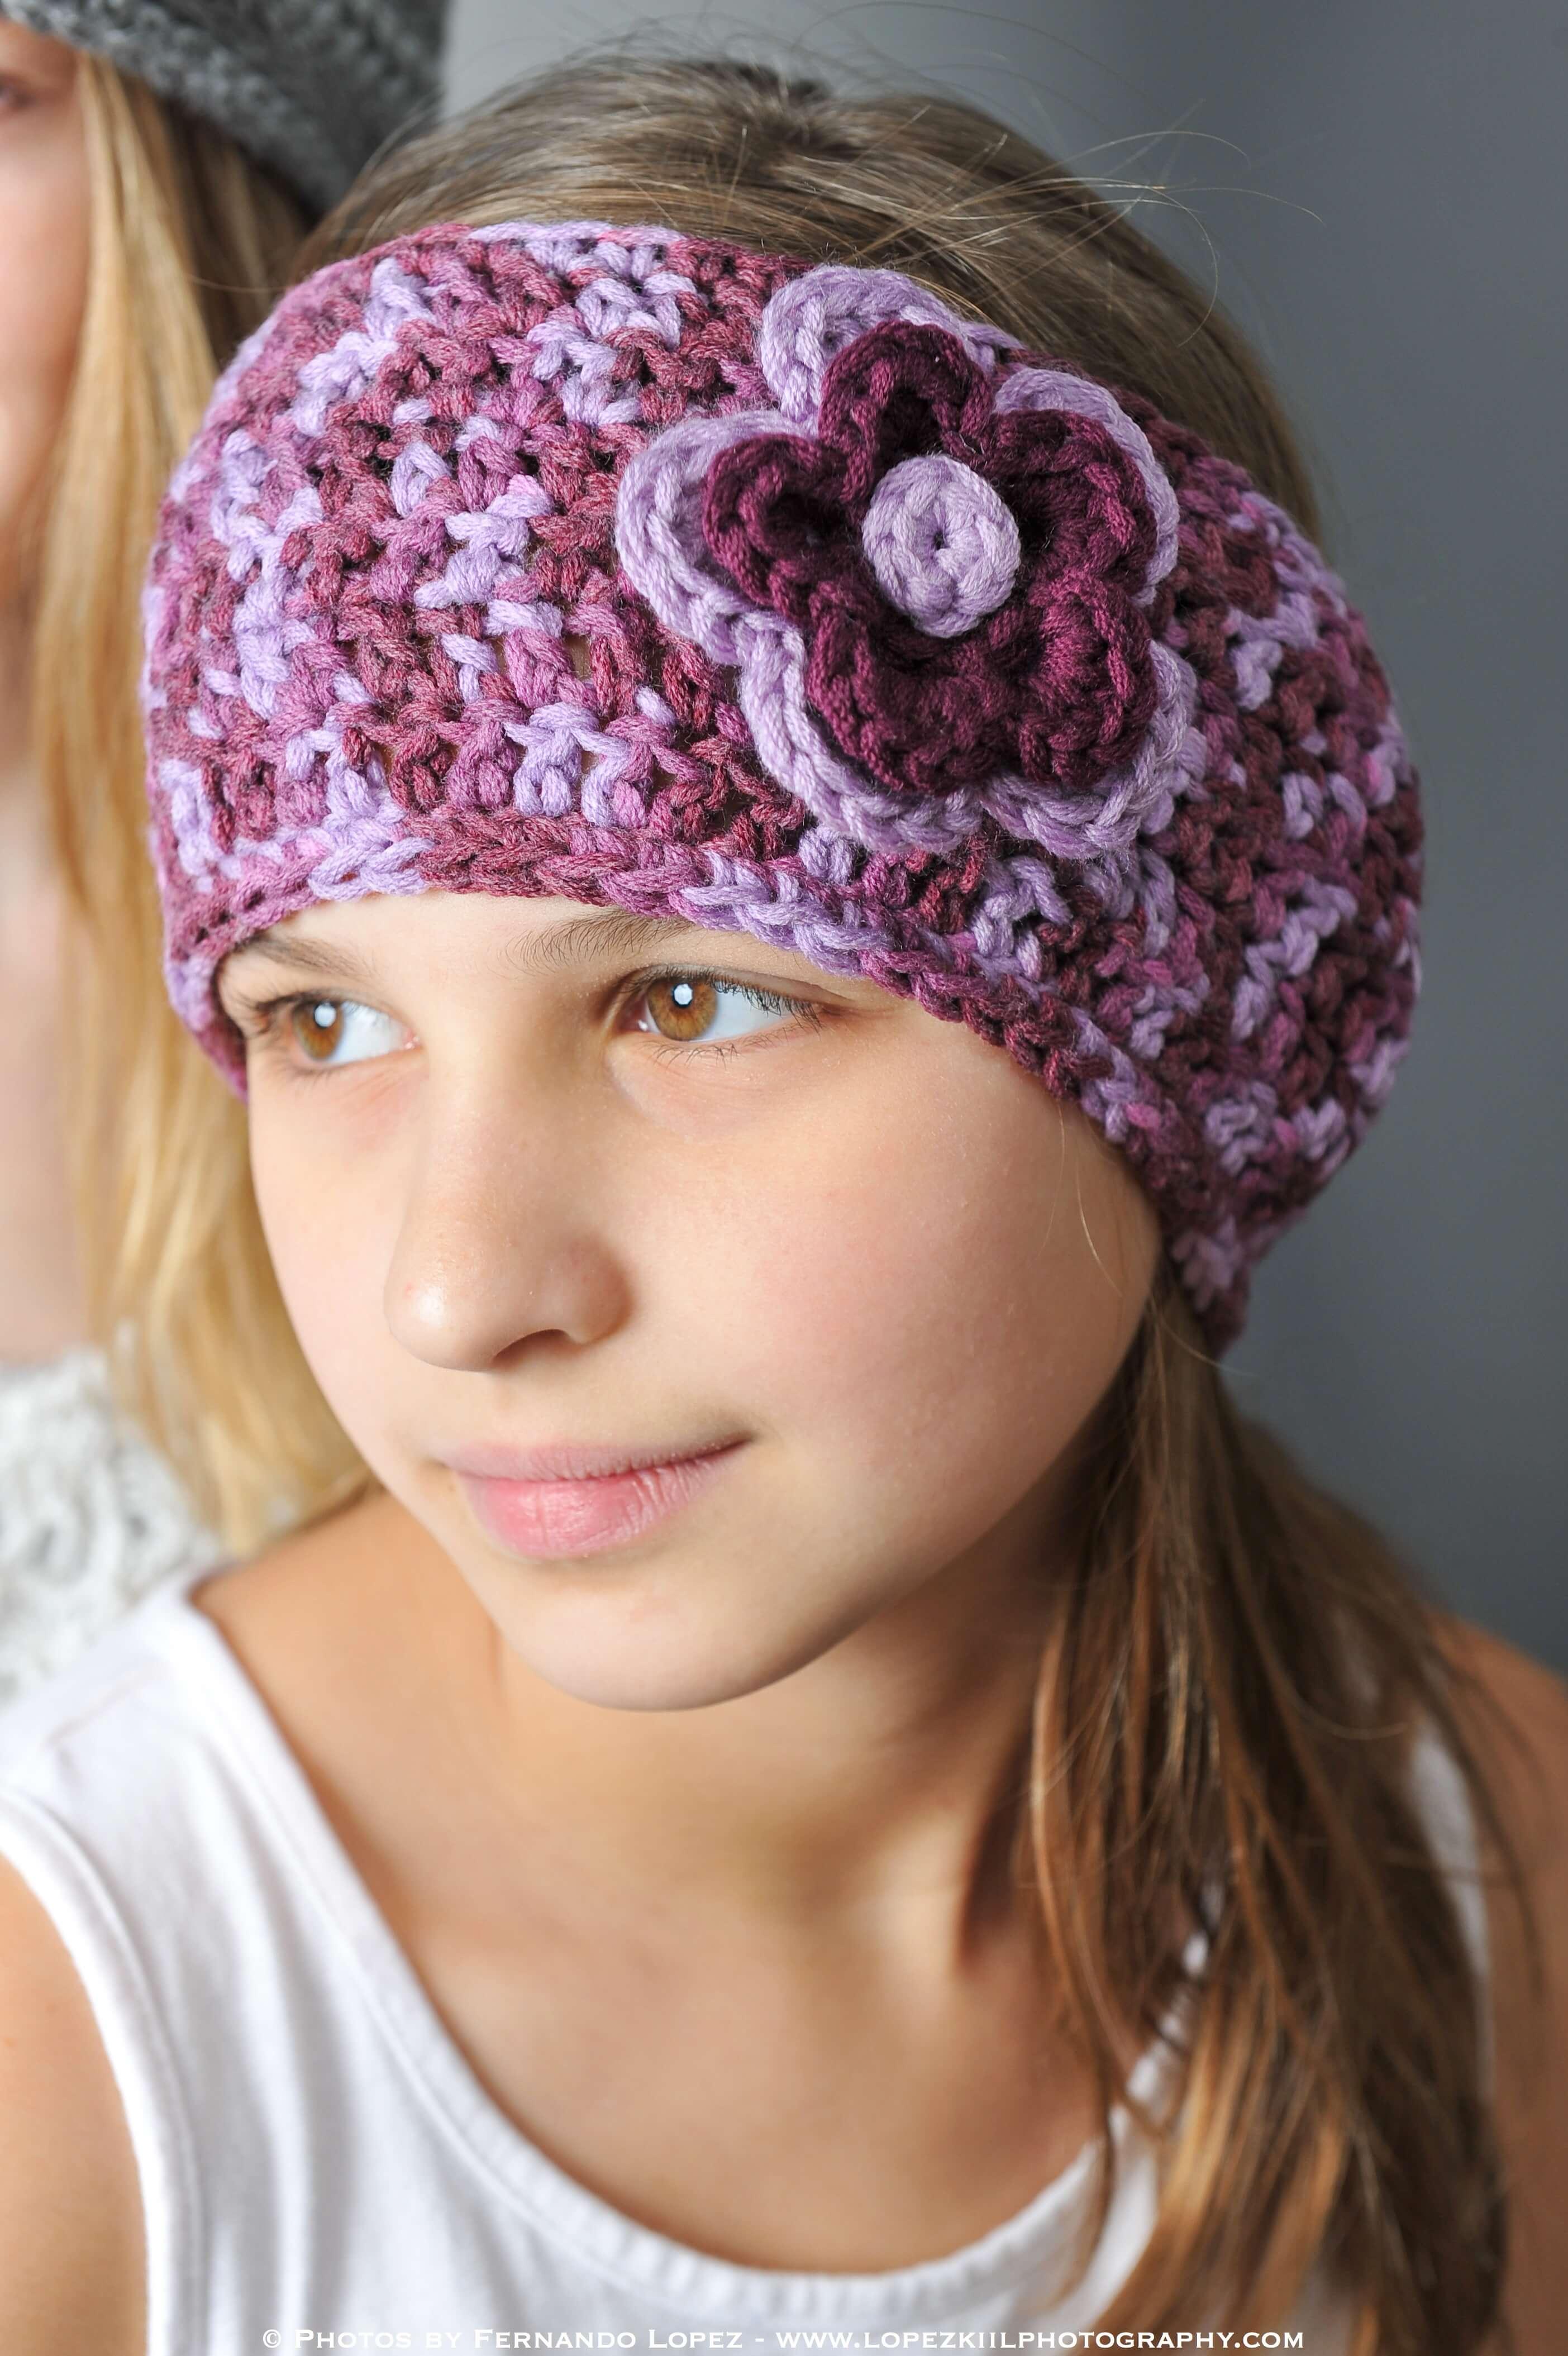 Crochet Flower Ear Warmer Tutorial : Crochet Ear Warmer with Layered Flowers Petals to Picots